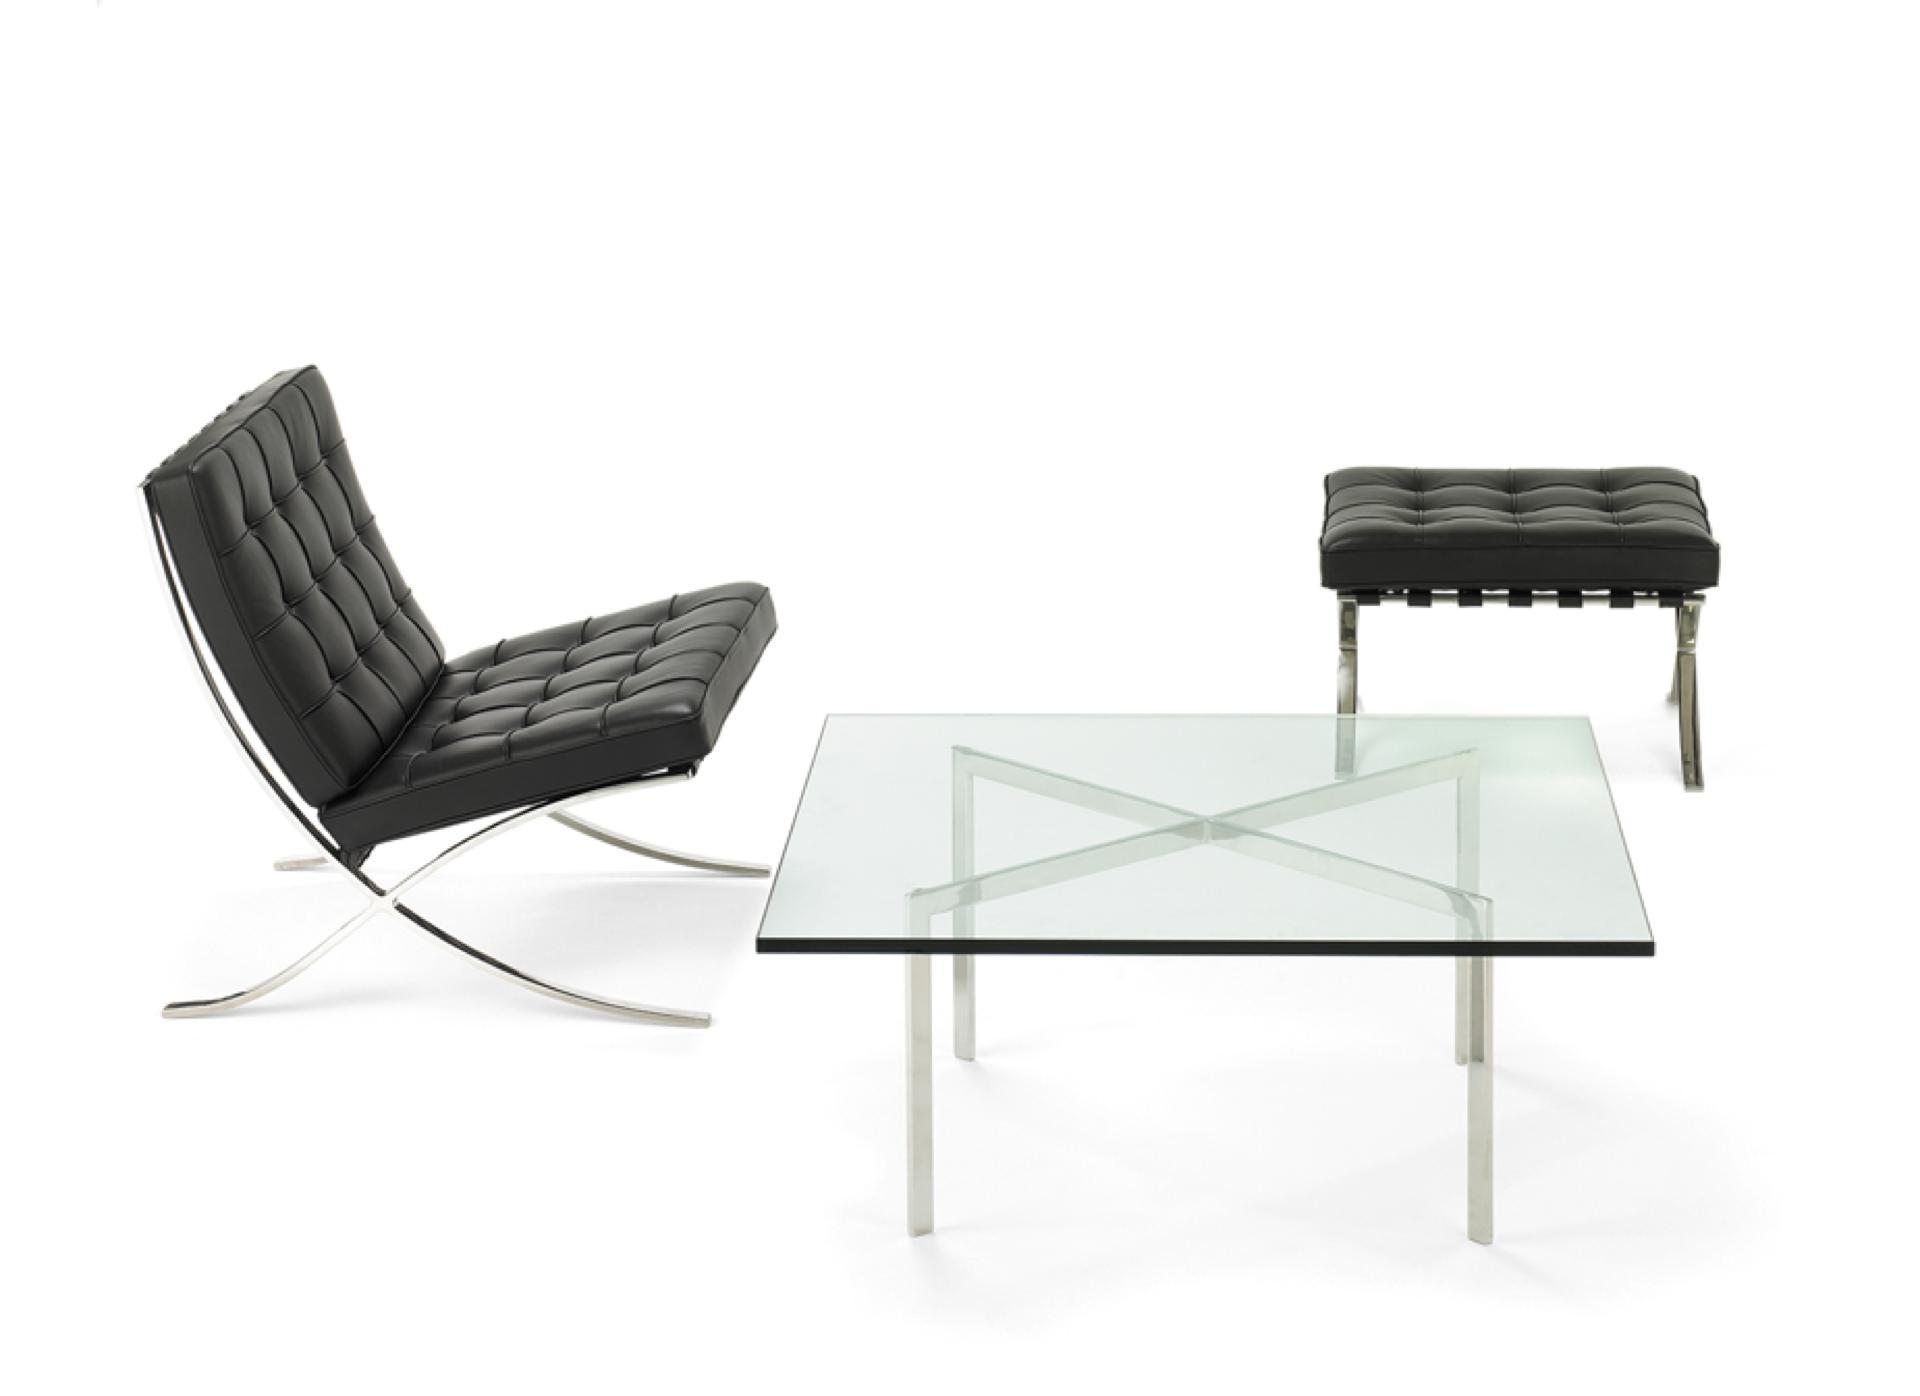 sofa for van singapore blue furniture barcelona chair dimensions homesfeed